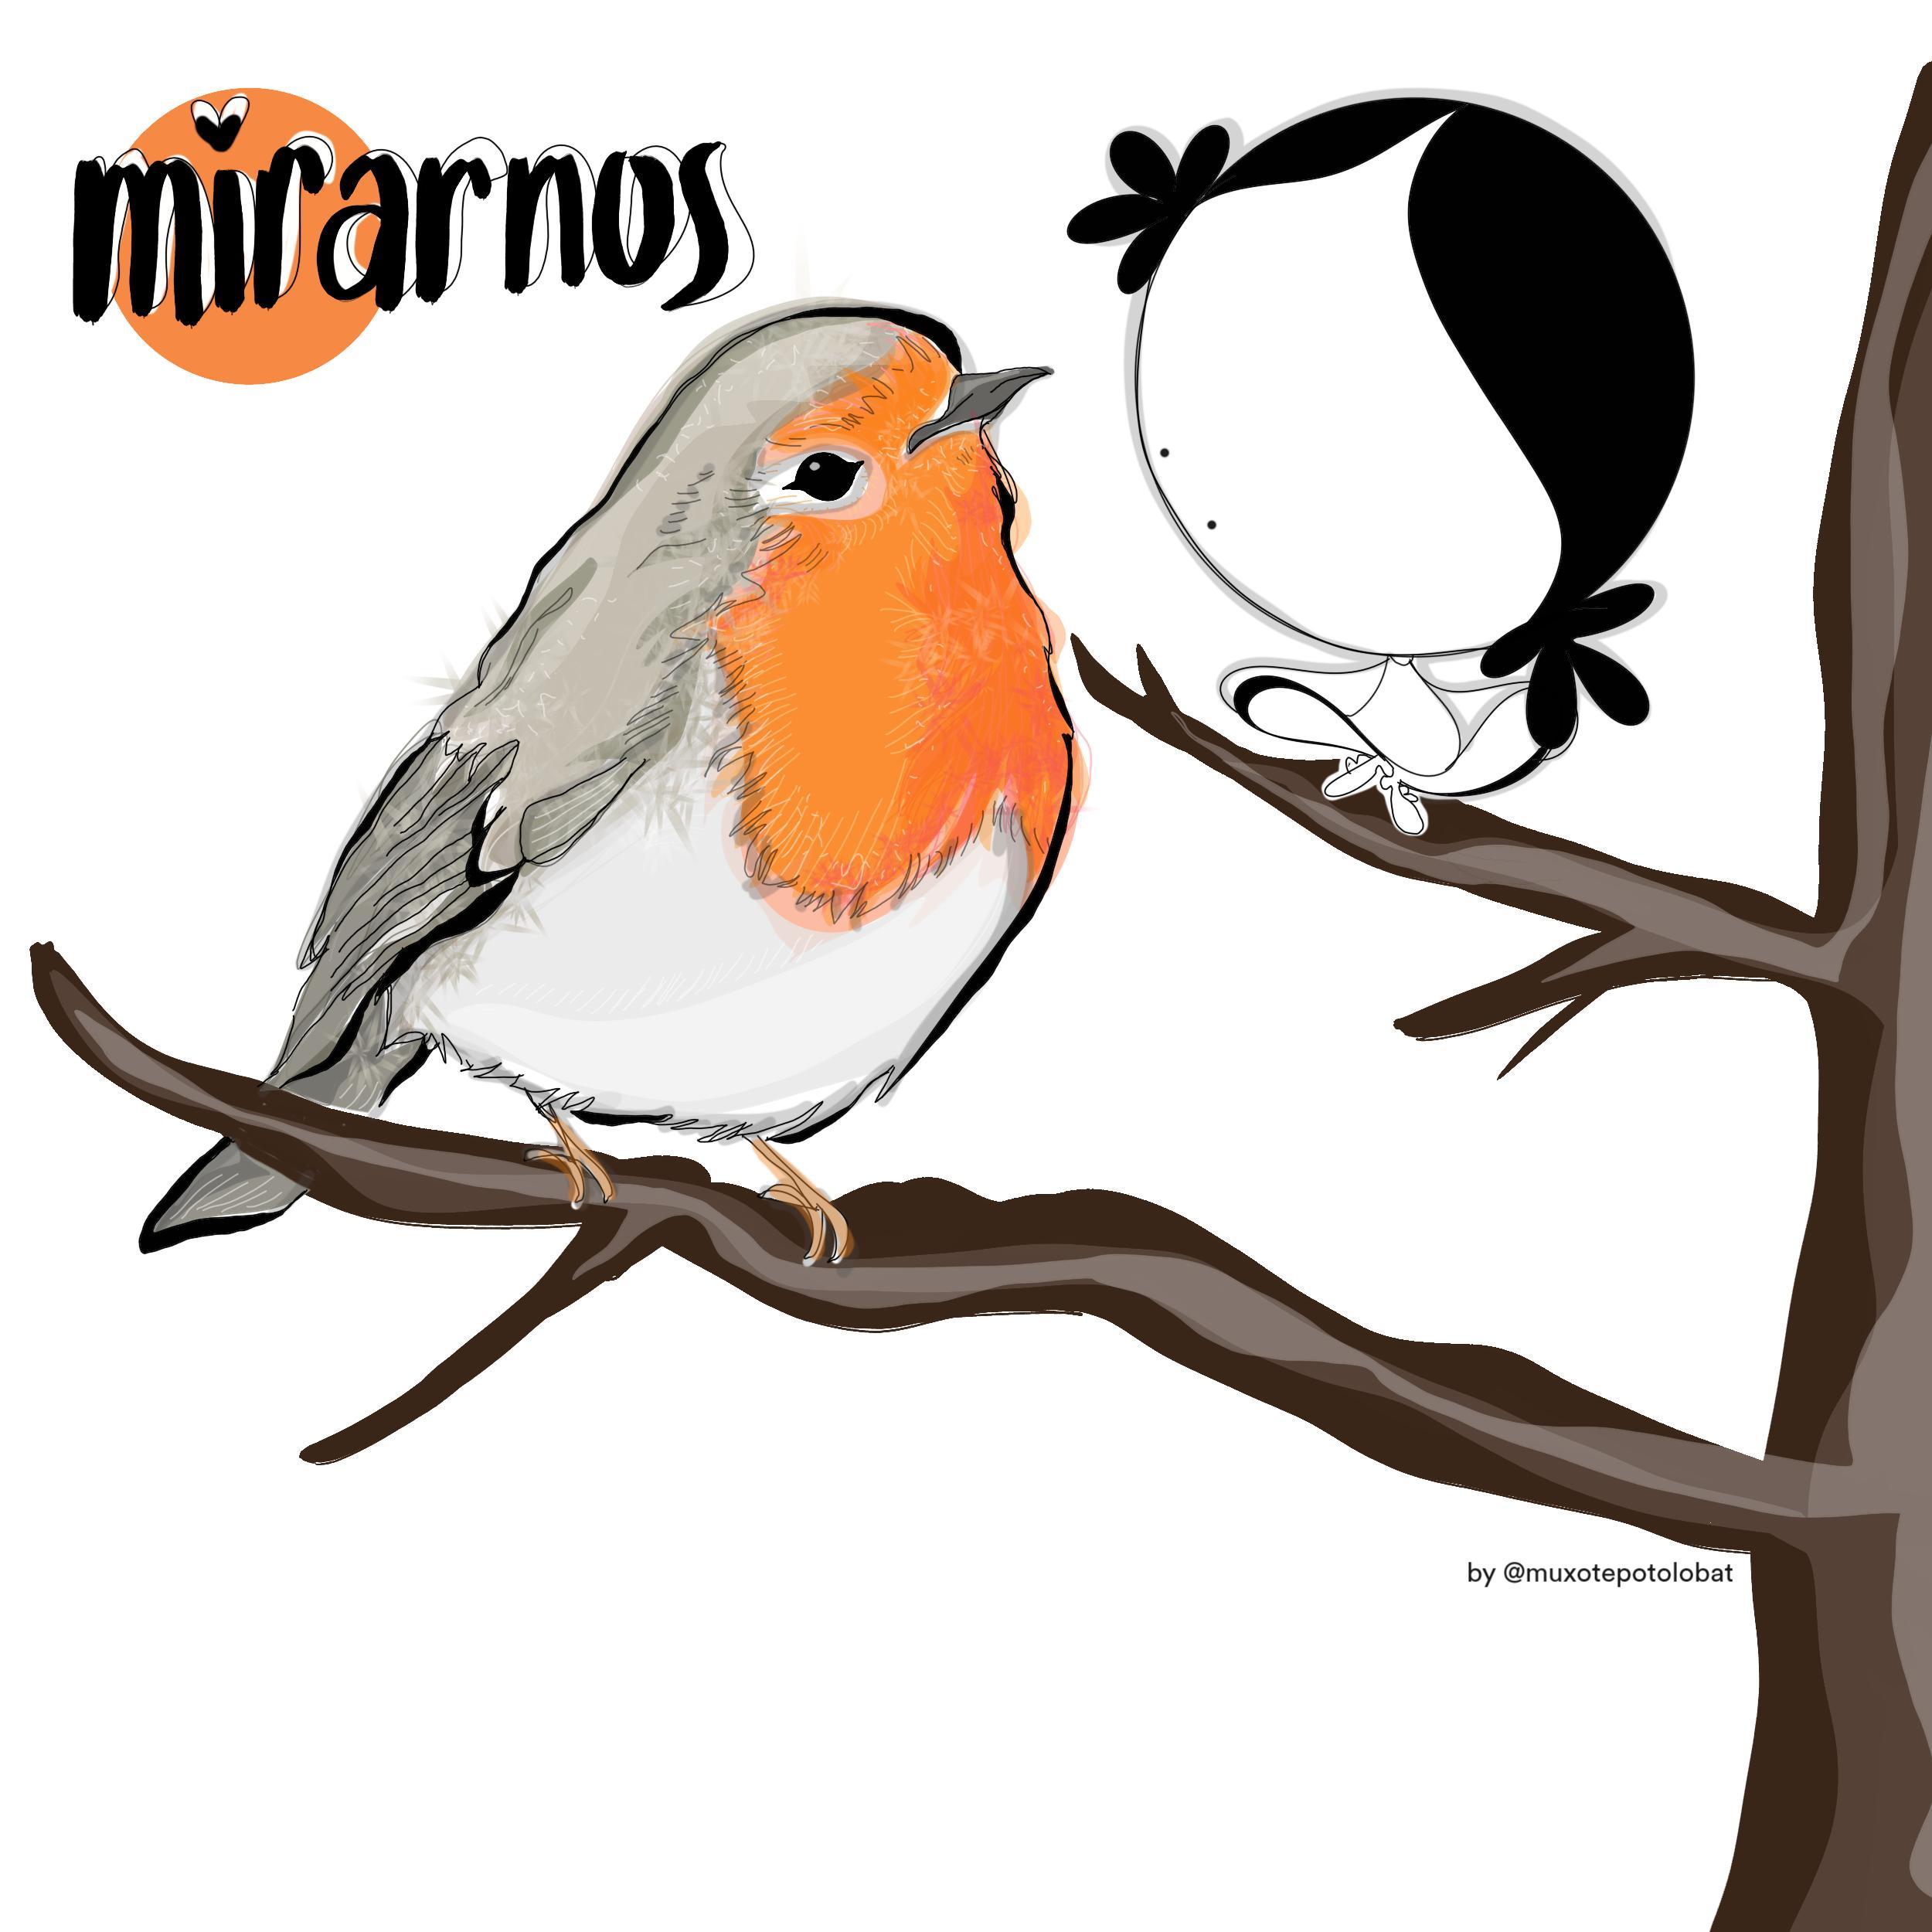 mirarnos by Muxote Potolo Bat